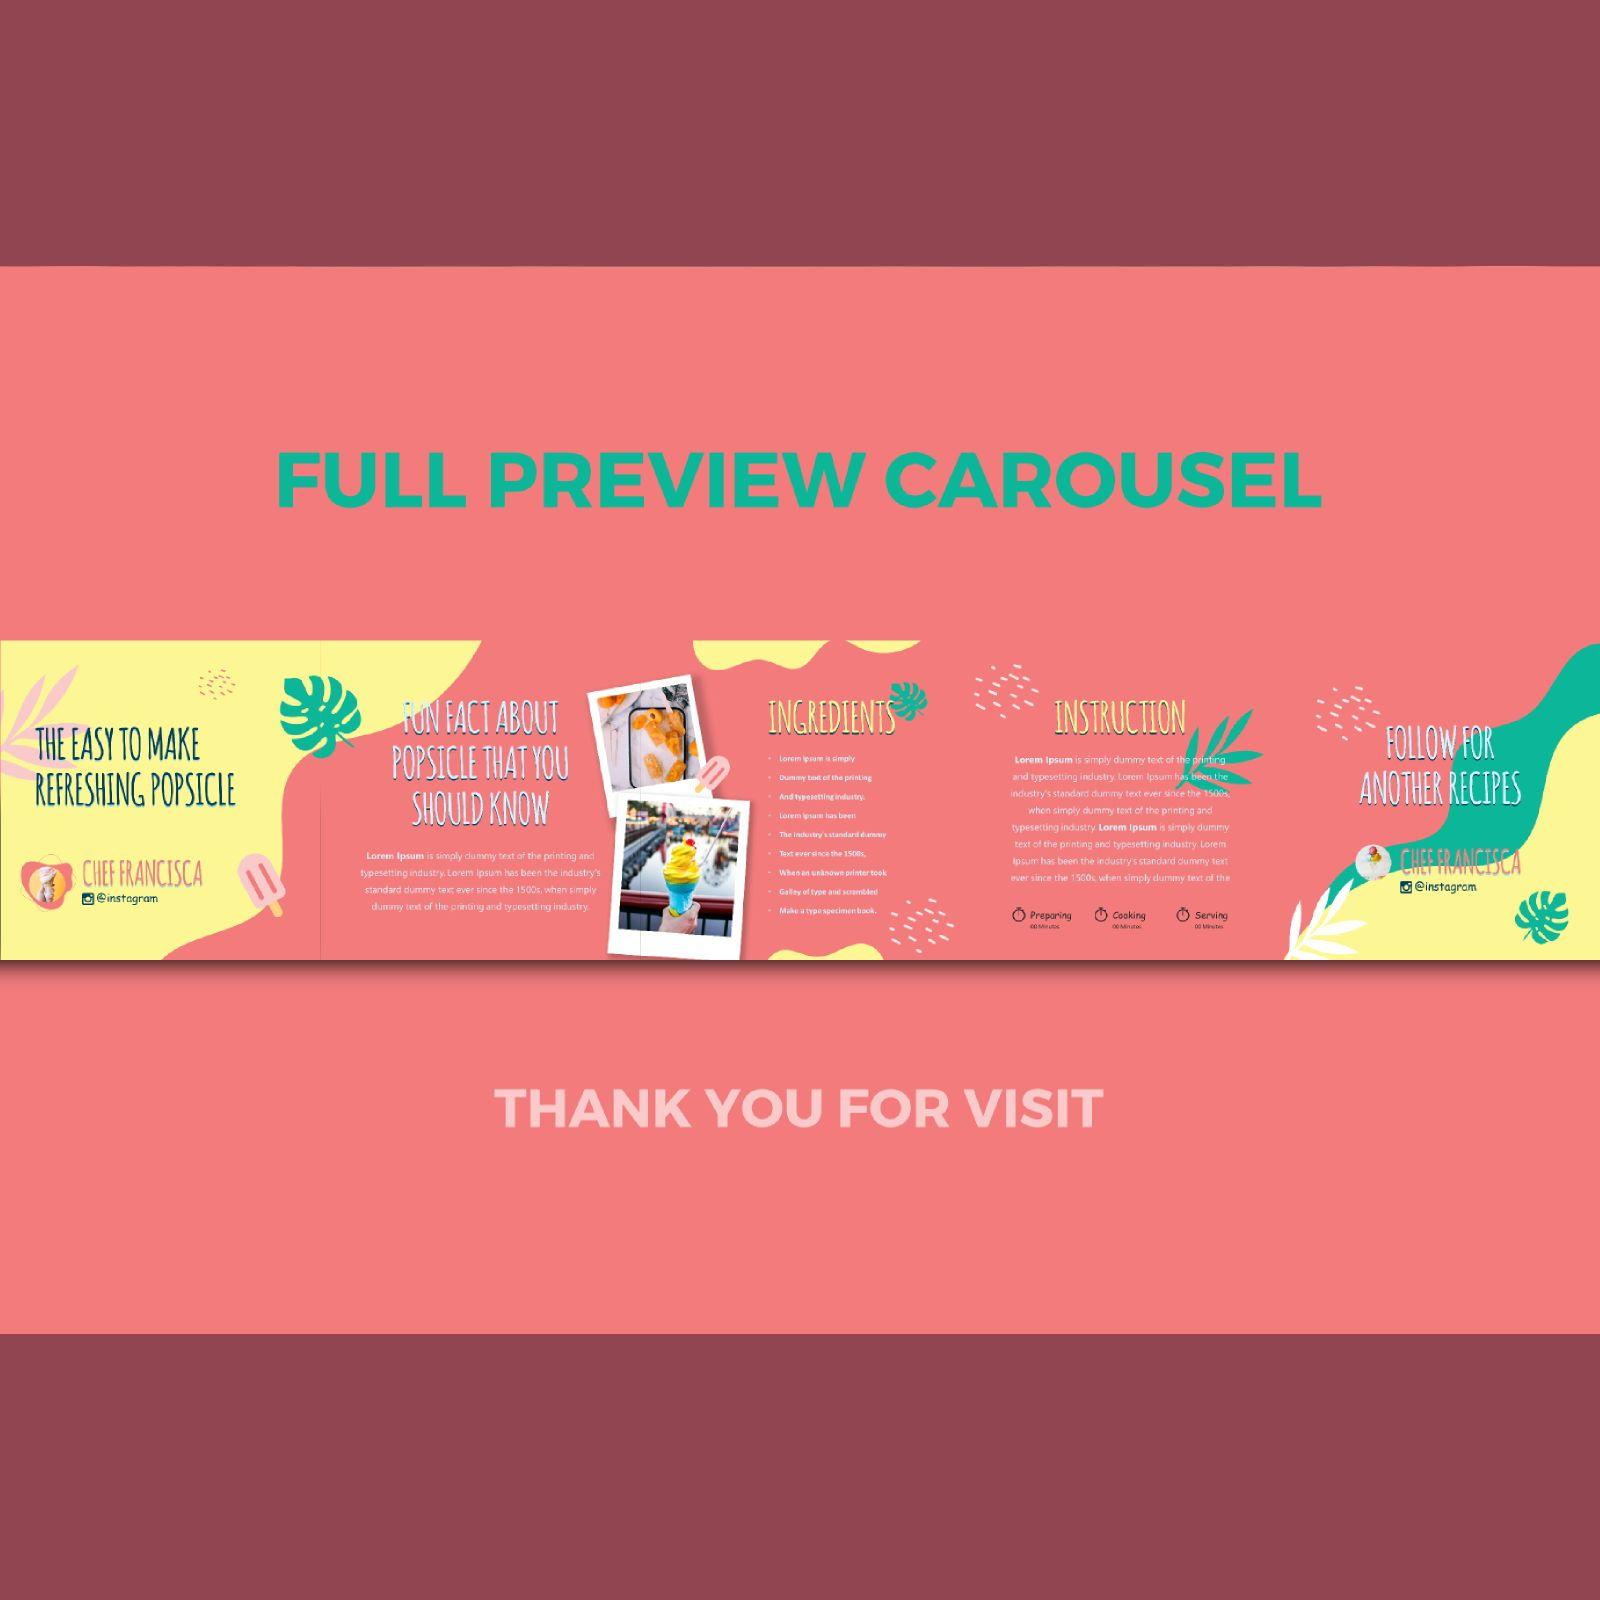 Summer ice recipe instagram carousel keynote template, Slide 3, 08368, Infographics — PoweredTemplate.com